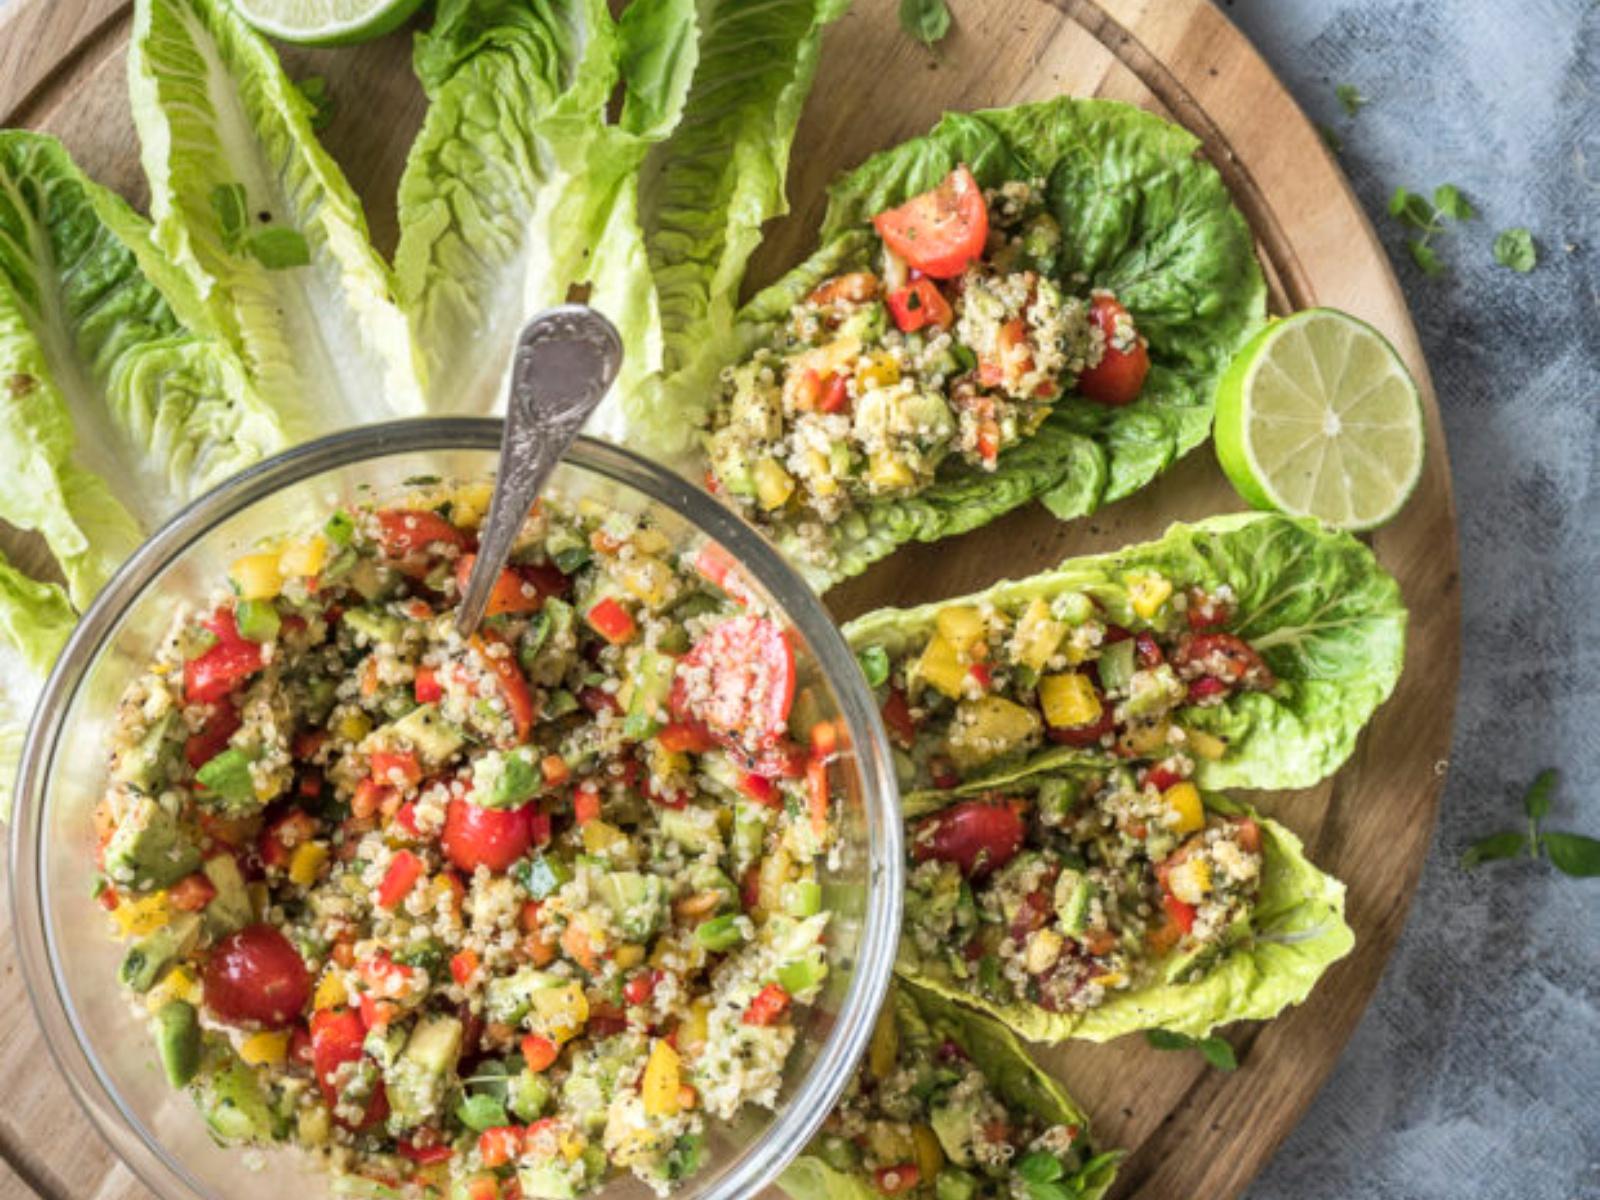 Quinoa Avocado Lettuce Wraps